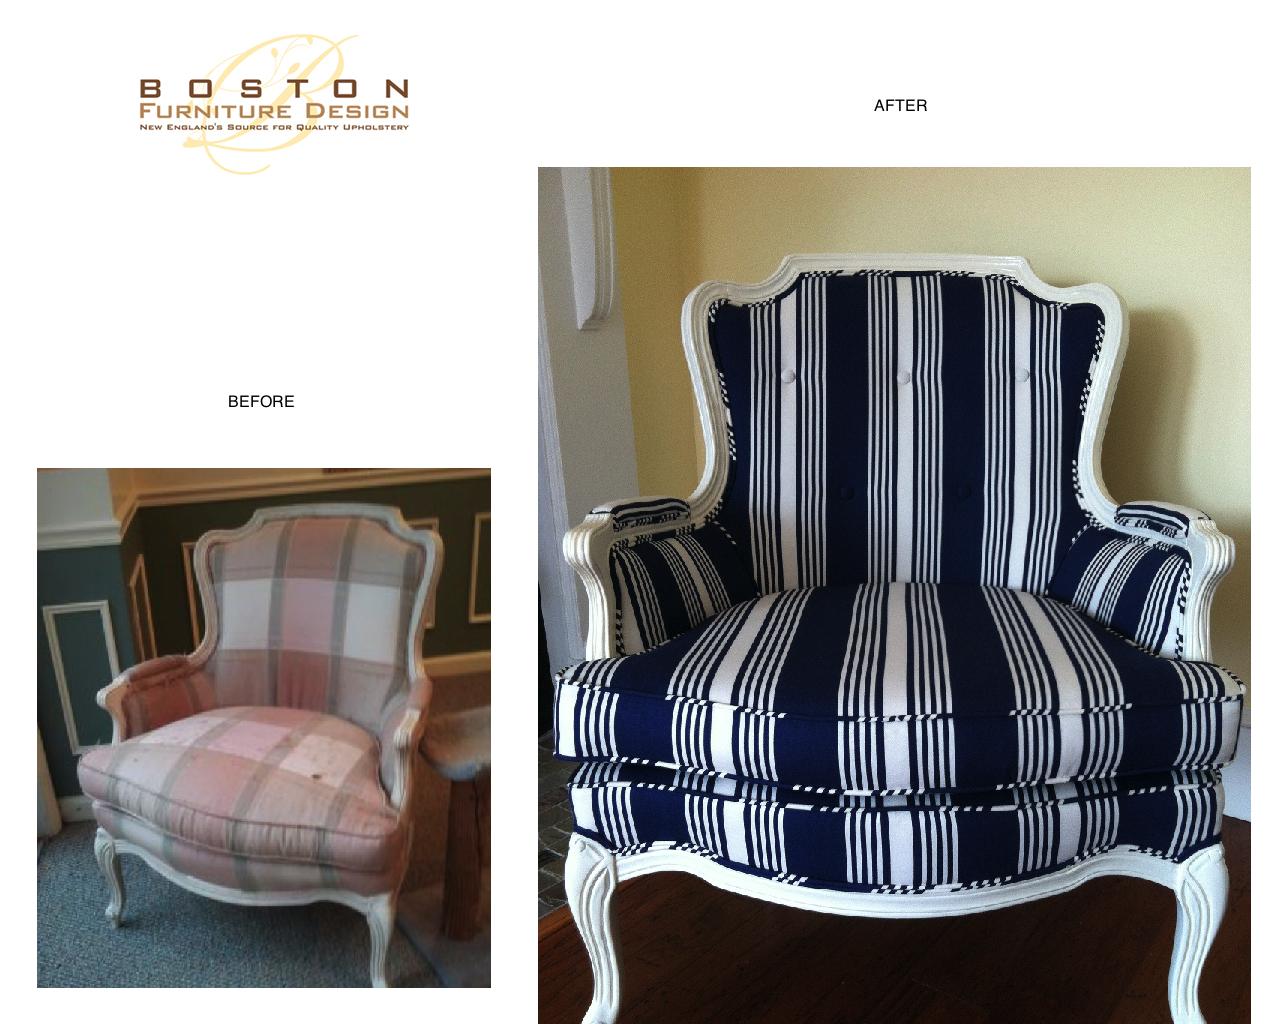 Boston Furniture Design Www Bostonfurnituredesign Com Upholstery Designer Furniture Interiordes Boston Furniture Furniture Design Furniture Reupholstery